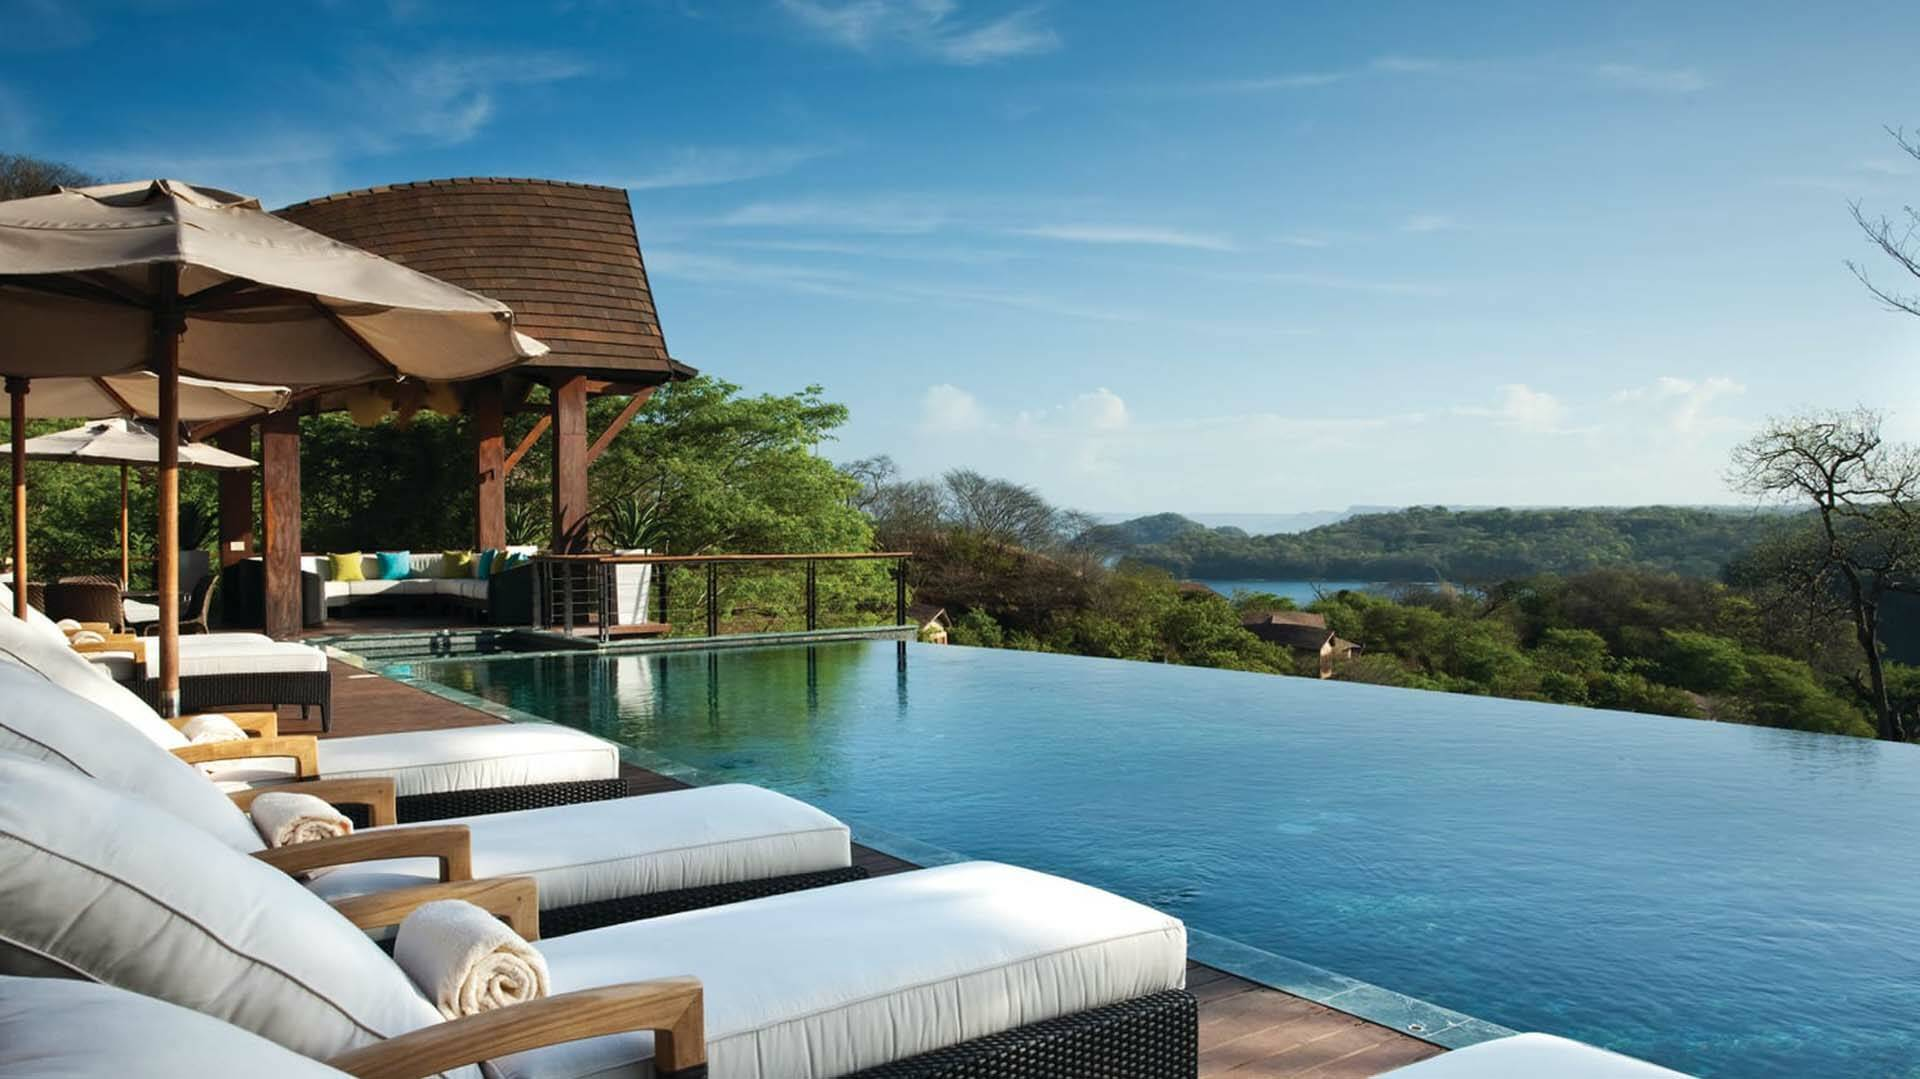 Costa Rica Four Seasons Papagayo Casa del Mar Residence